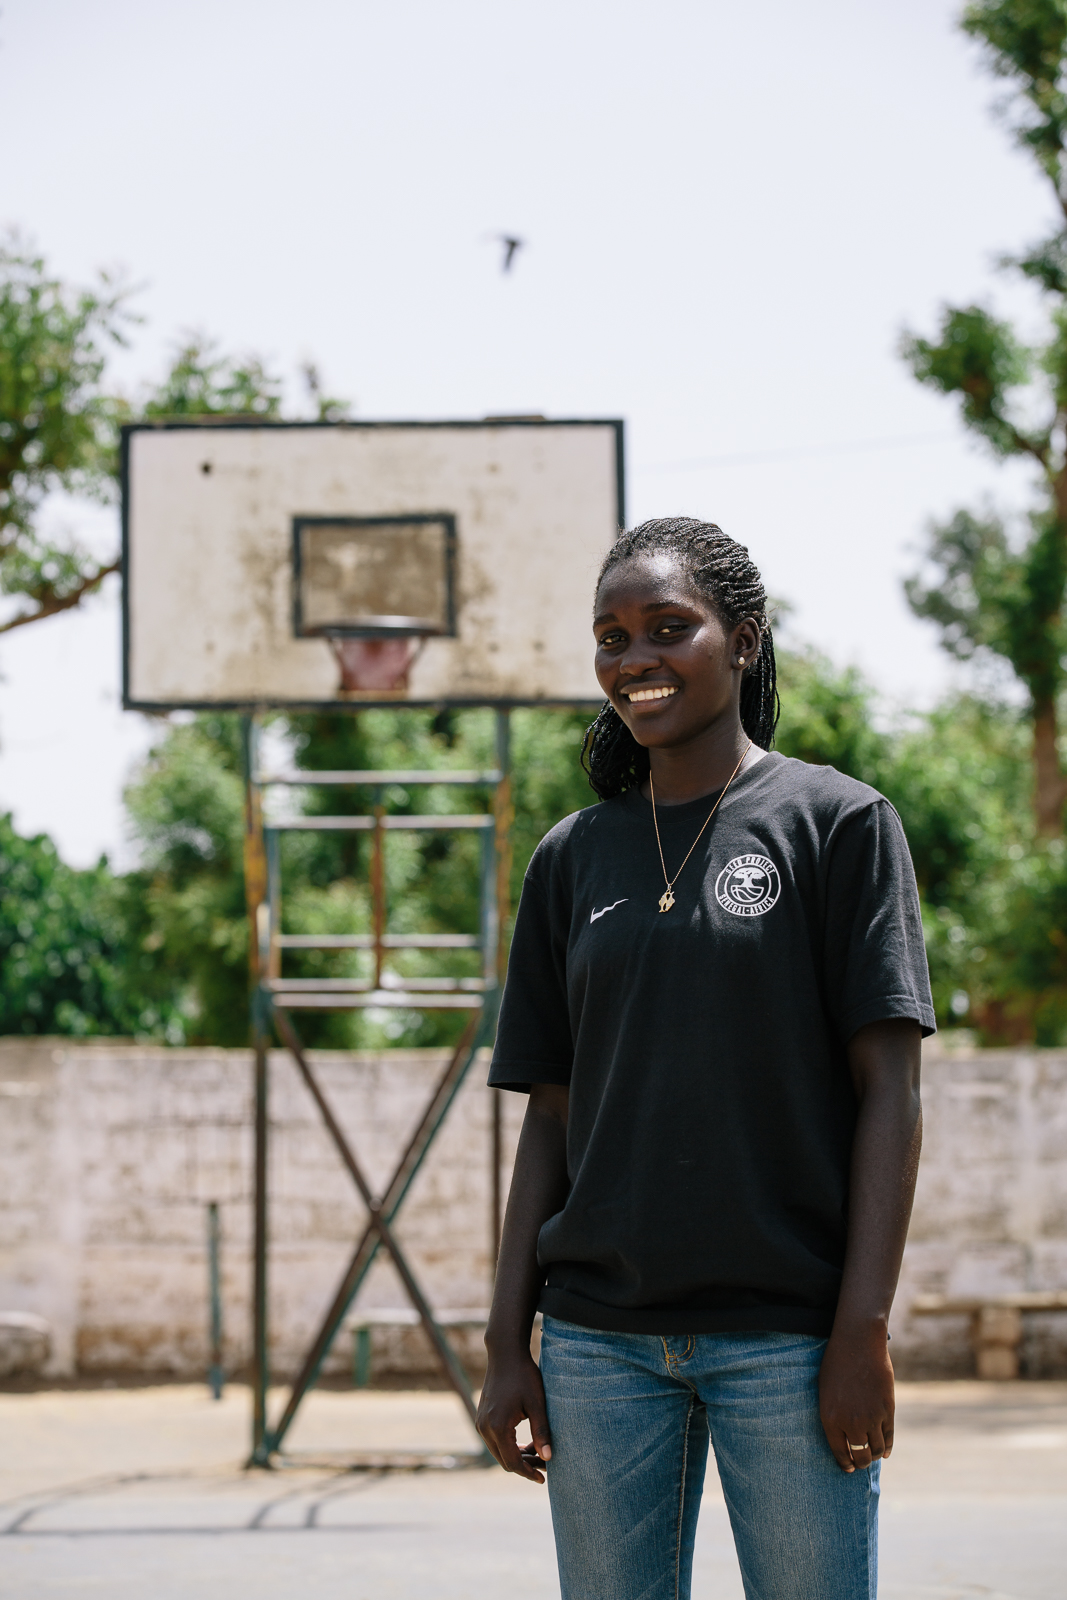 0028_20150531_Seed Academy_thiès_Senegal©KevinCouliau.jpg